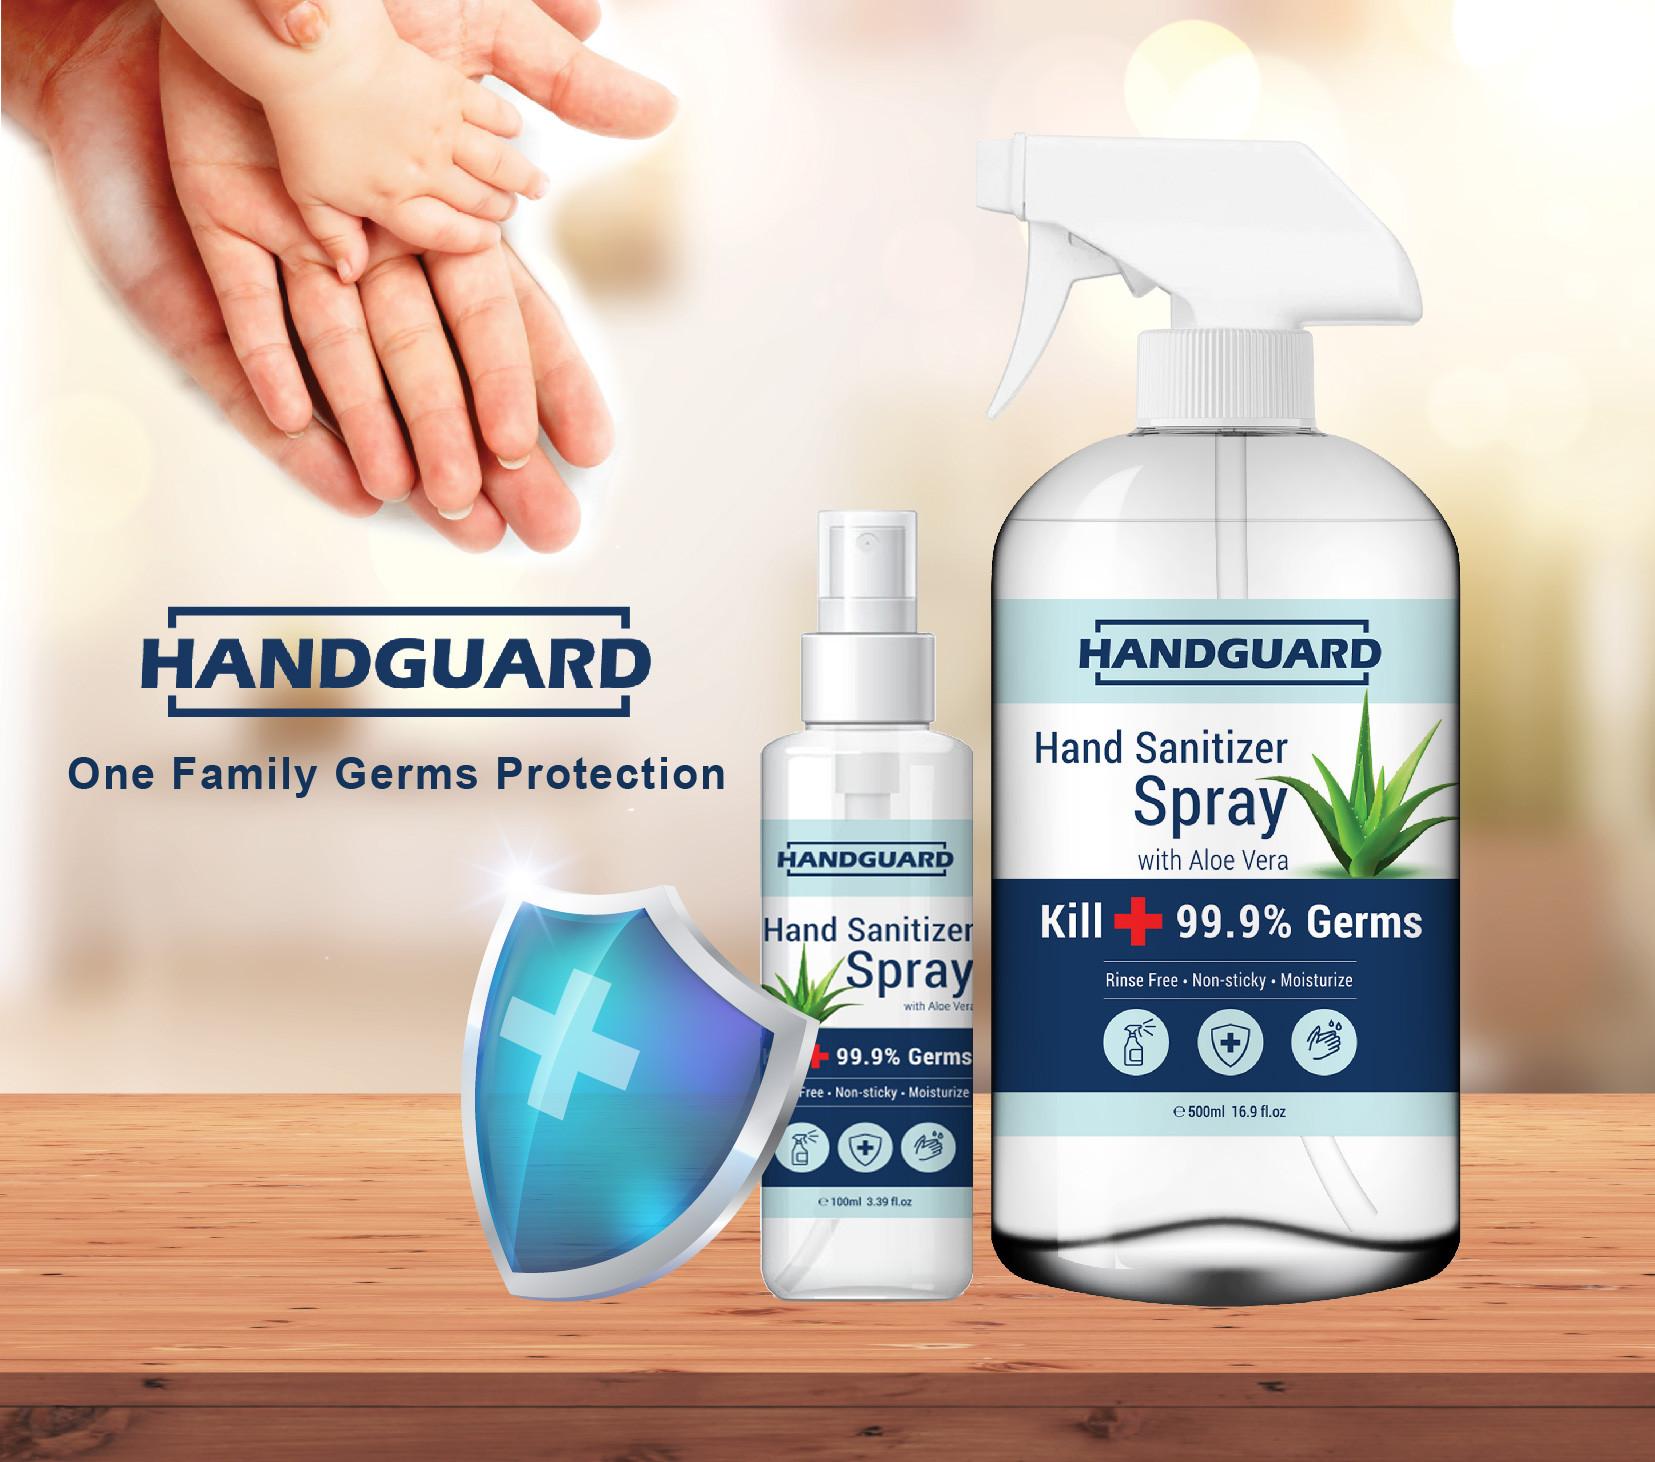 Handguard hand sanitizer spray POSM_7.jp